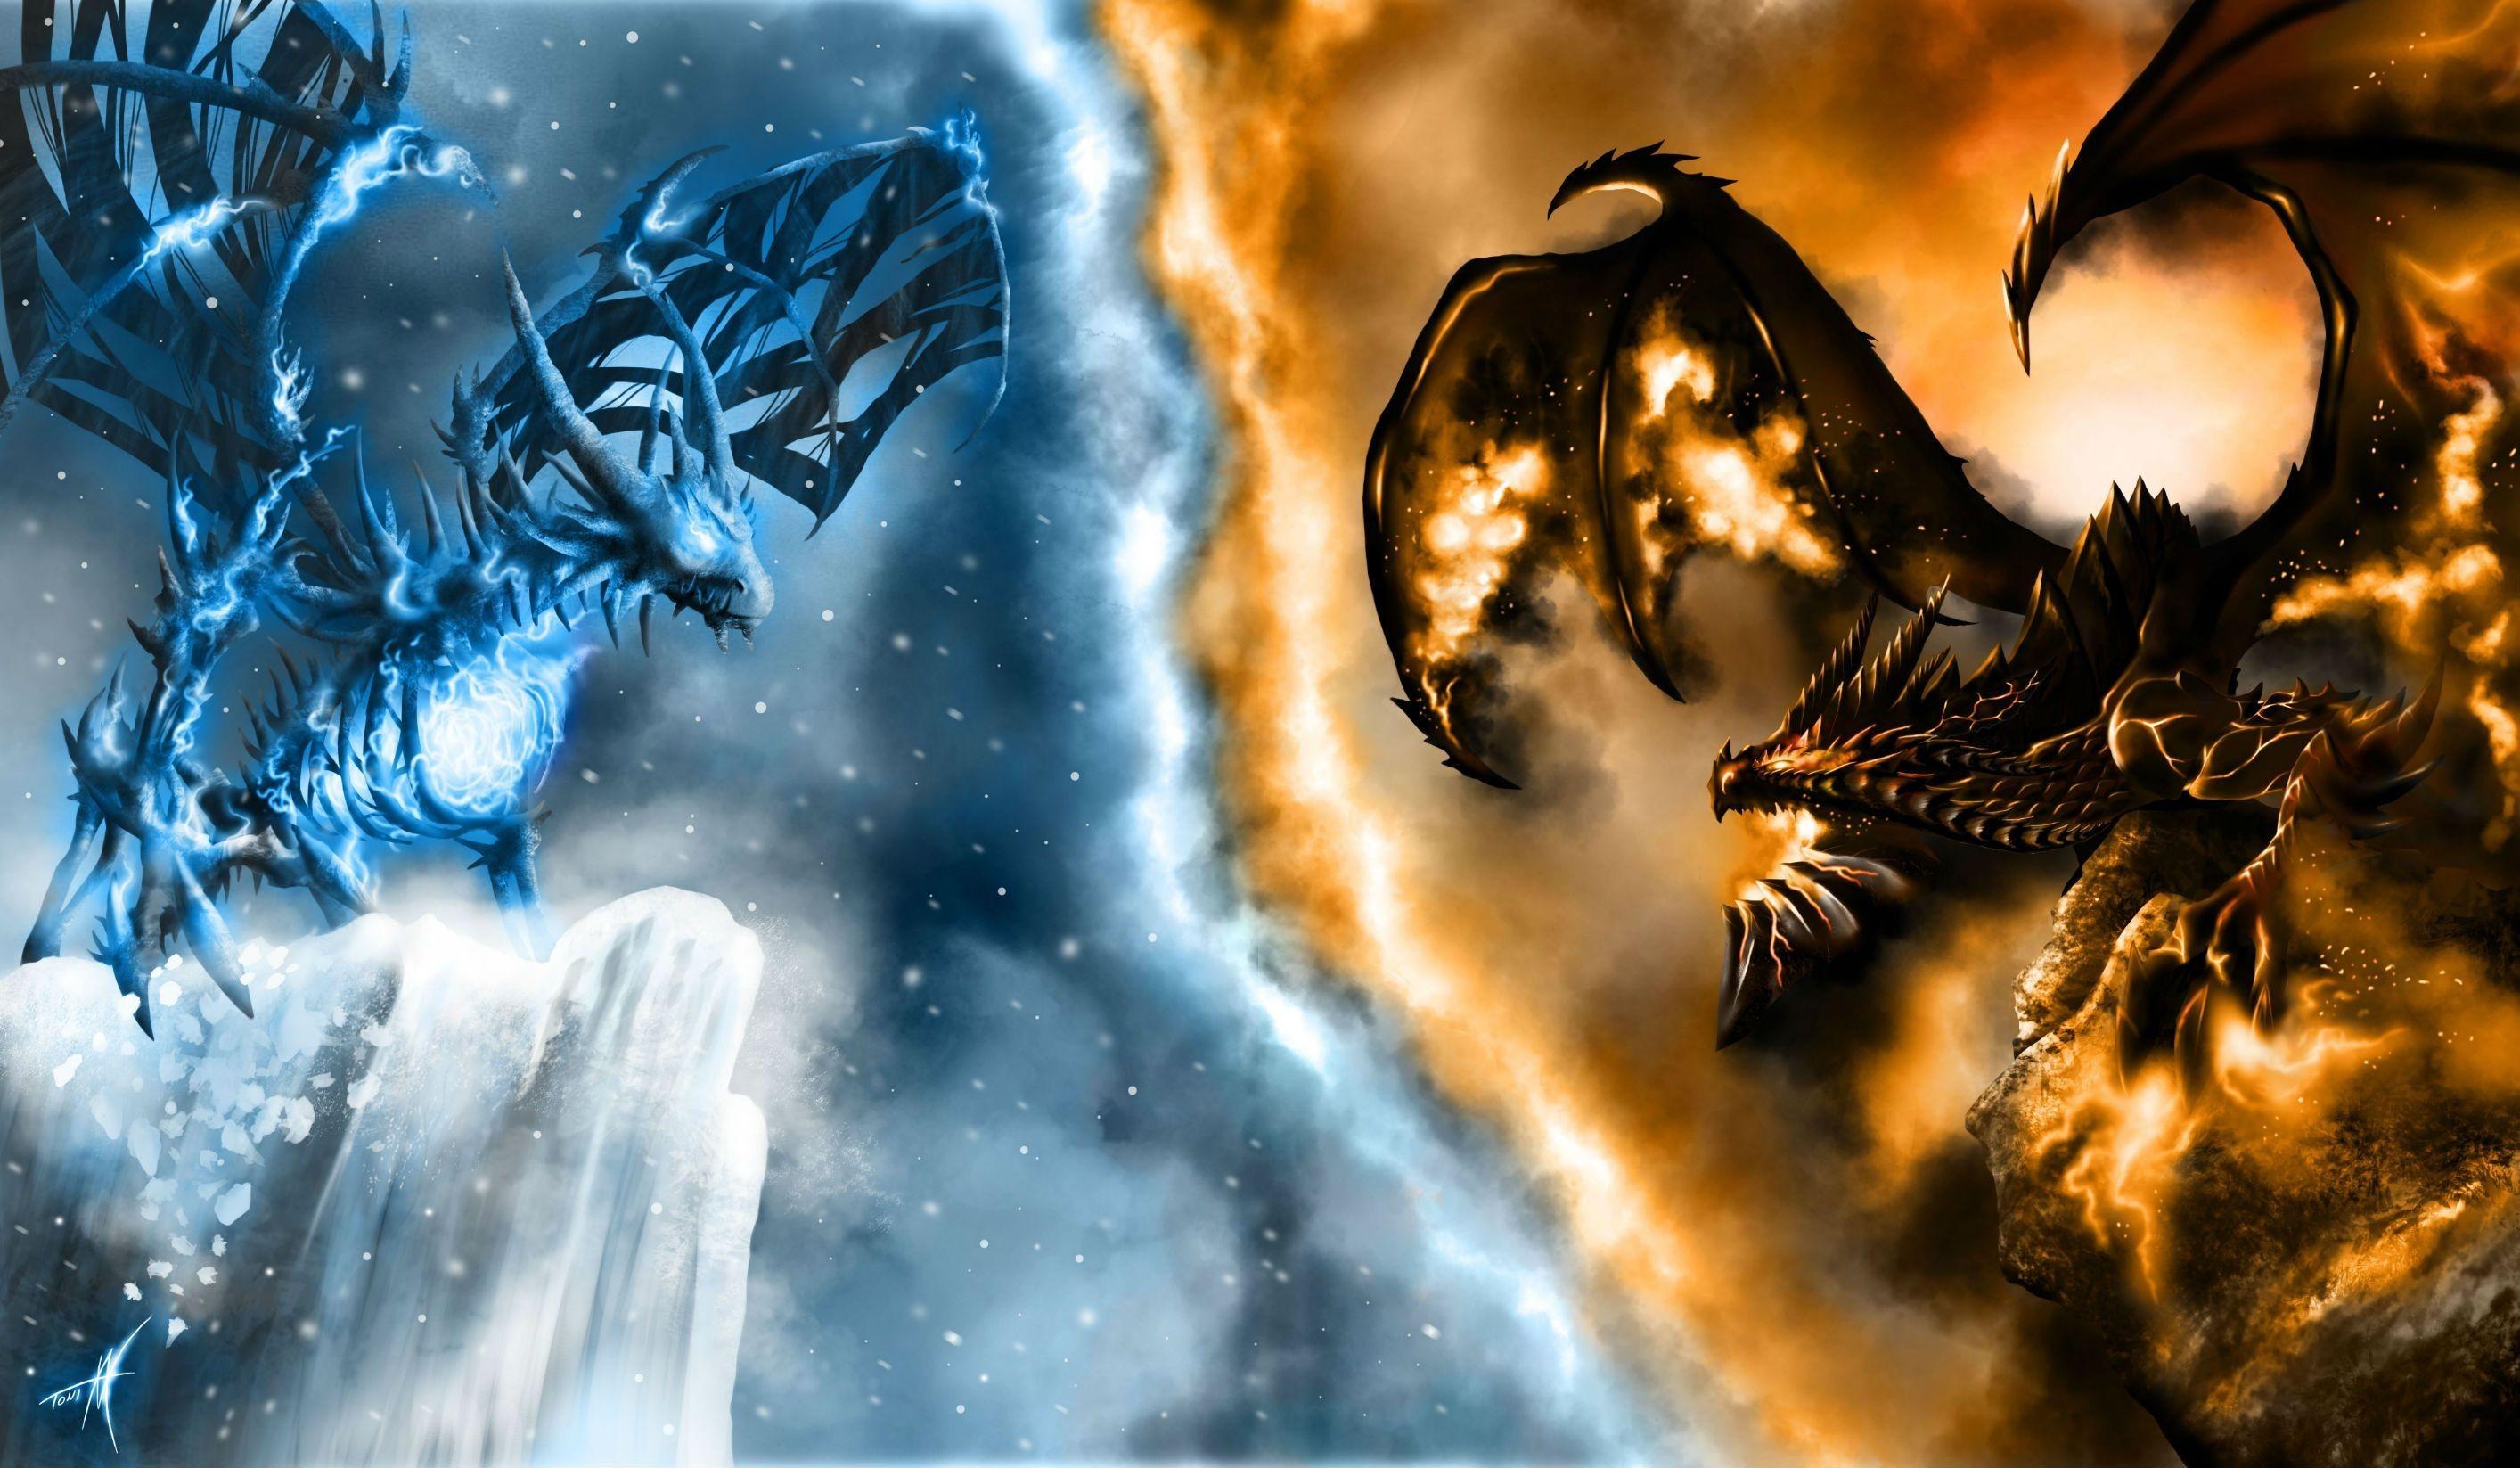 Wallpaper Fire Vs Ice Dragon 851227 Hd Wallpaper Backgrounds Download